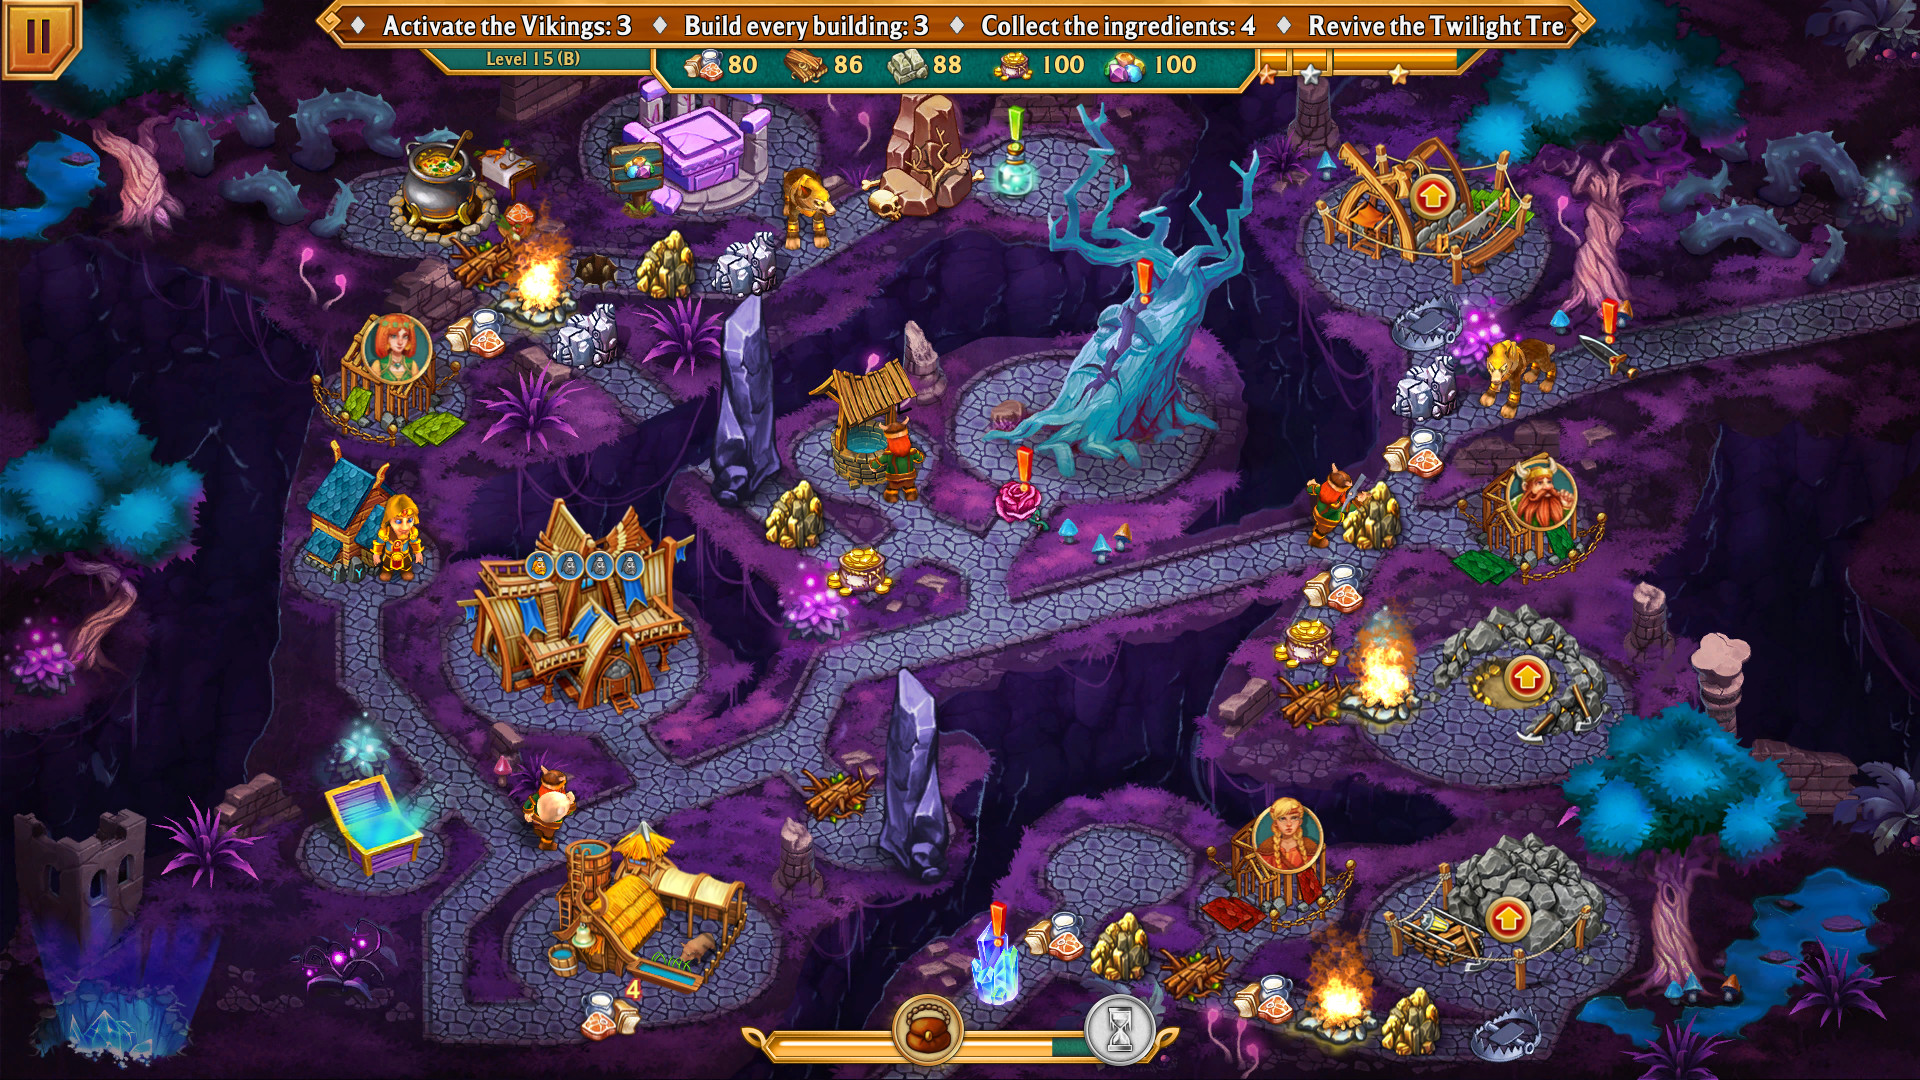 Viking Heroes 2 Free Download